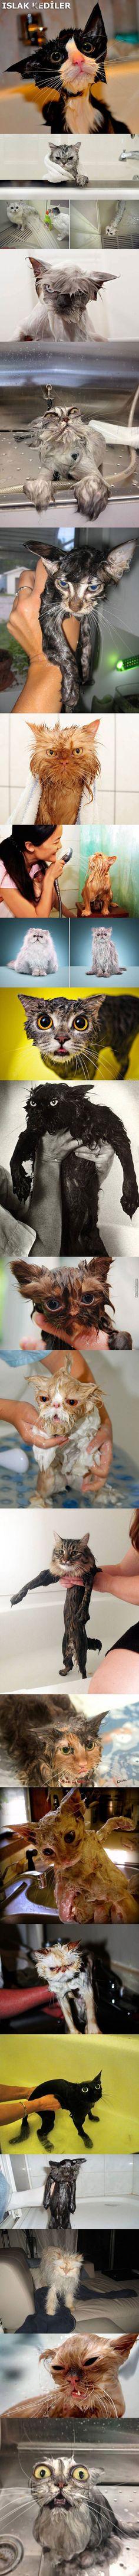 Islak kediler...